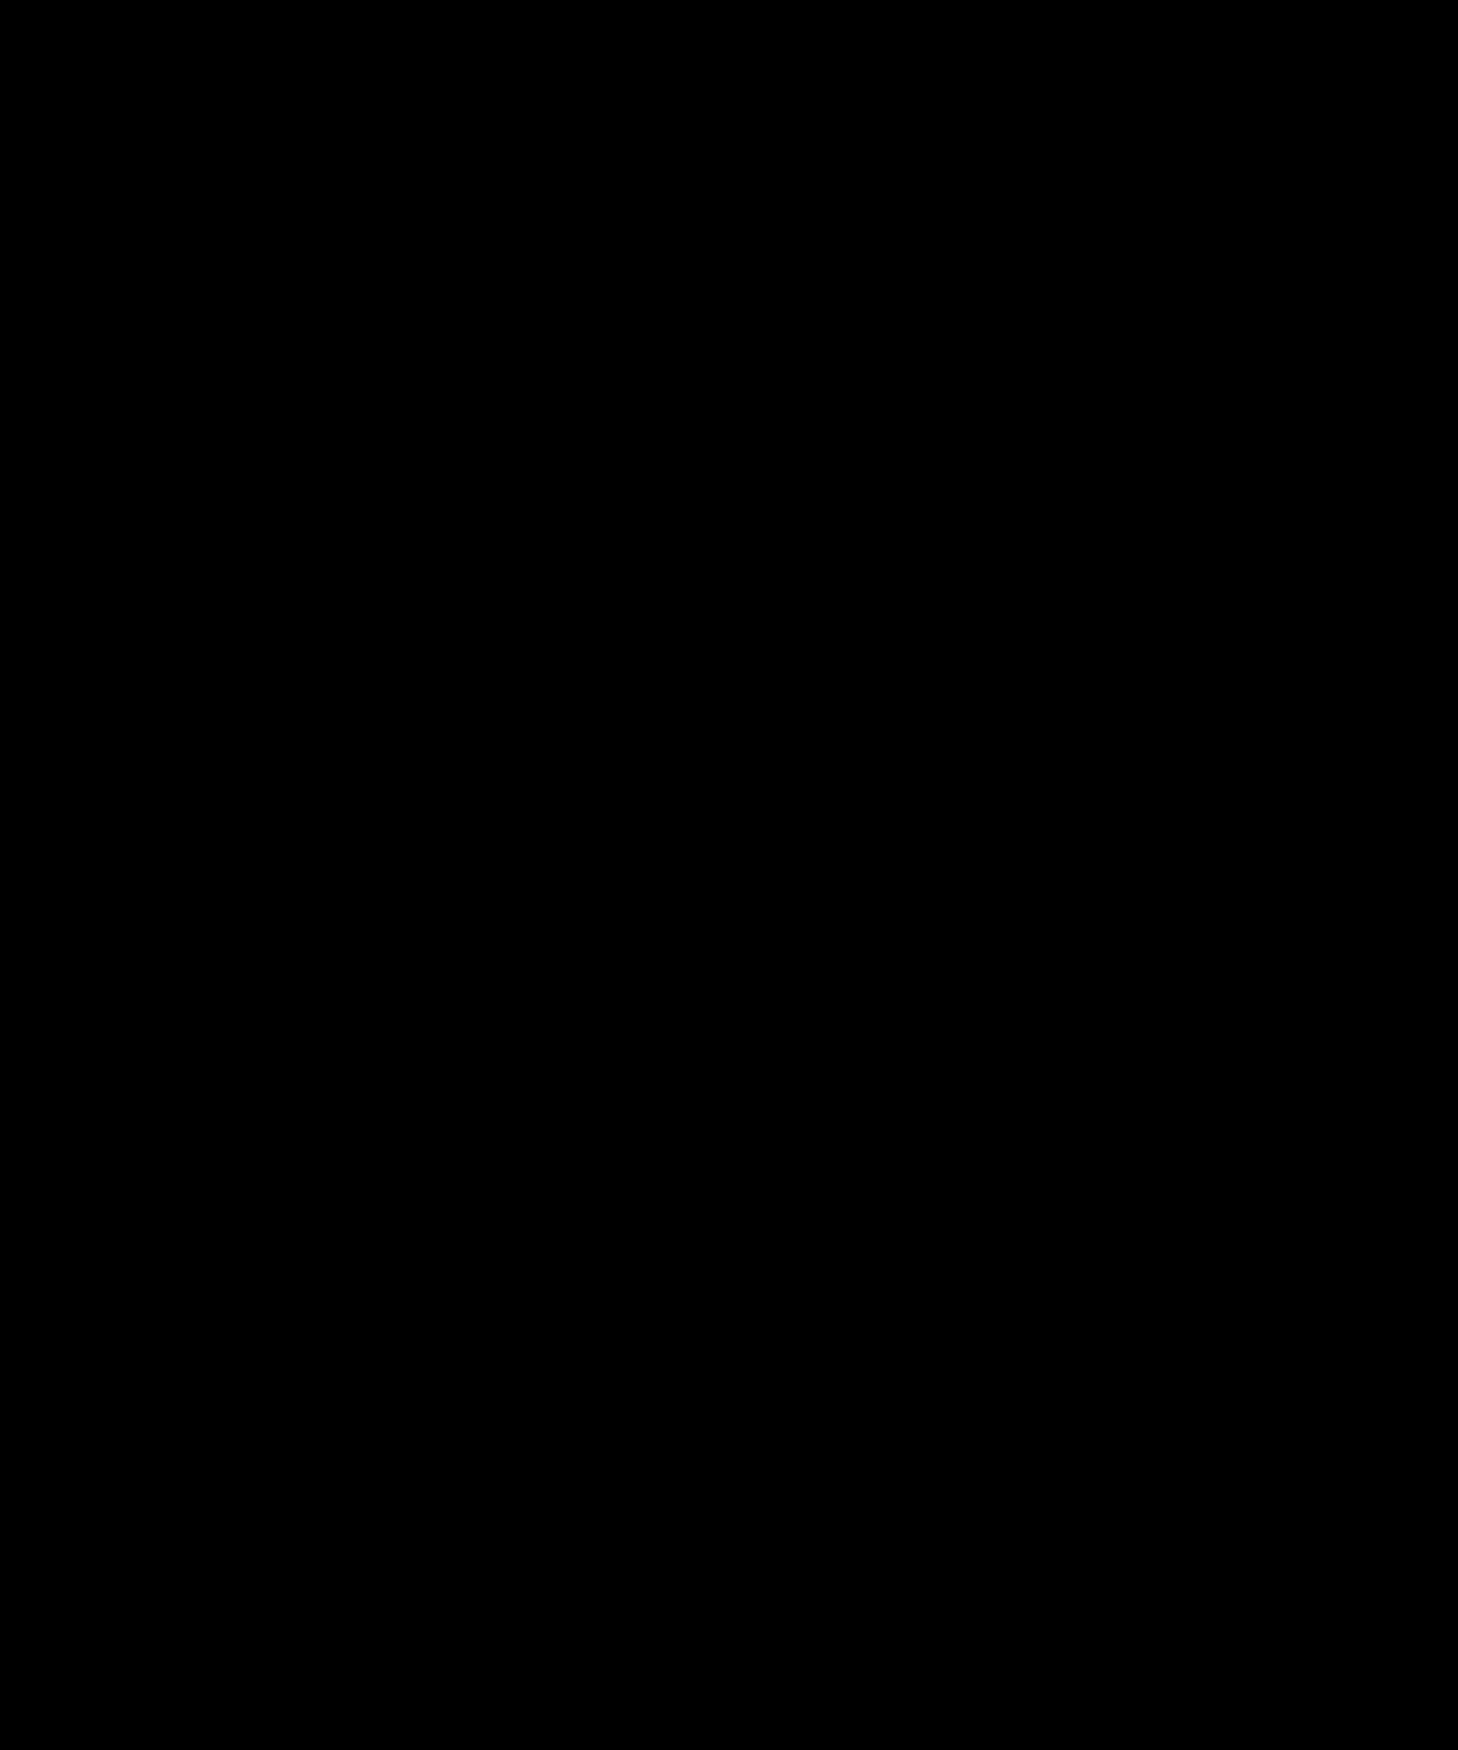 EN374-1: 2003 AJKL